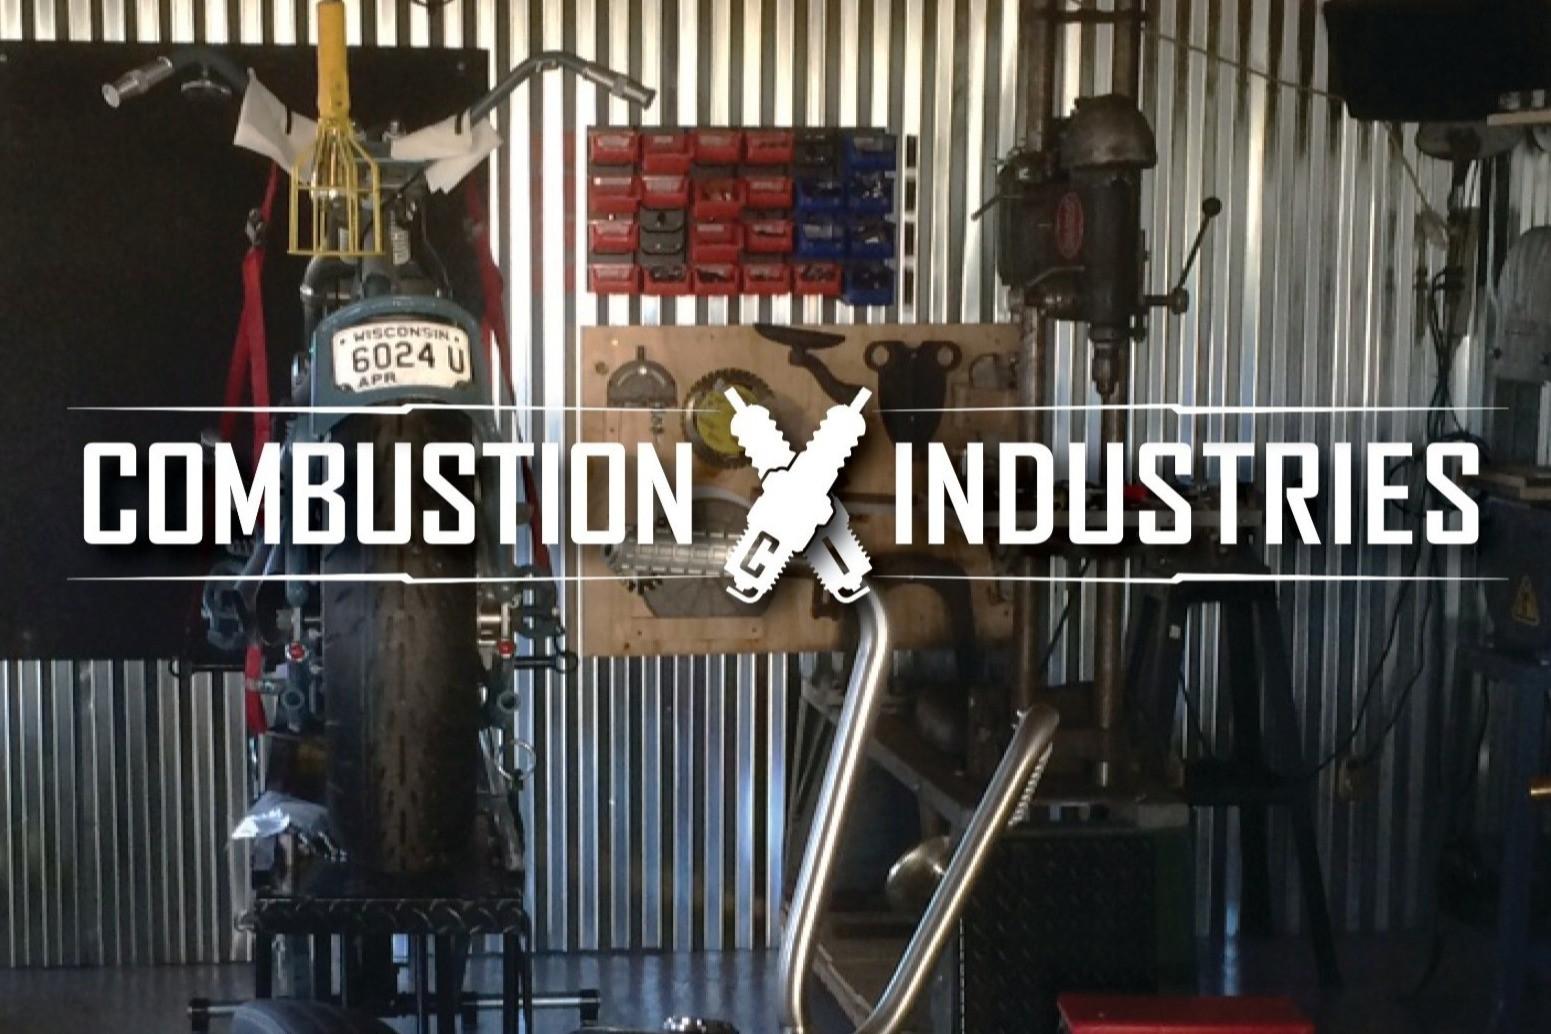 www.combustionindustries.com